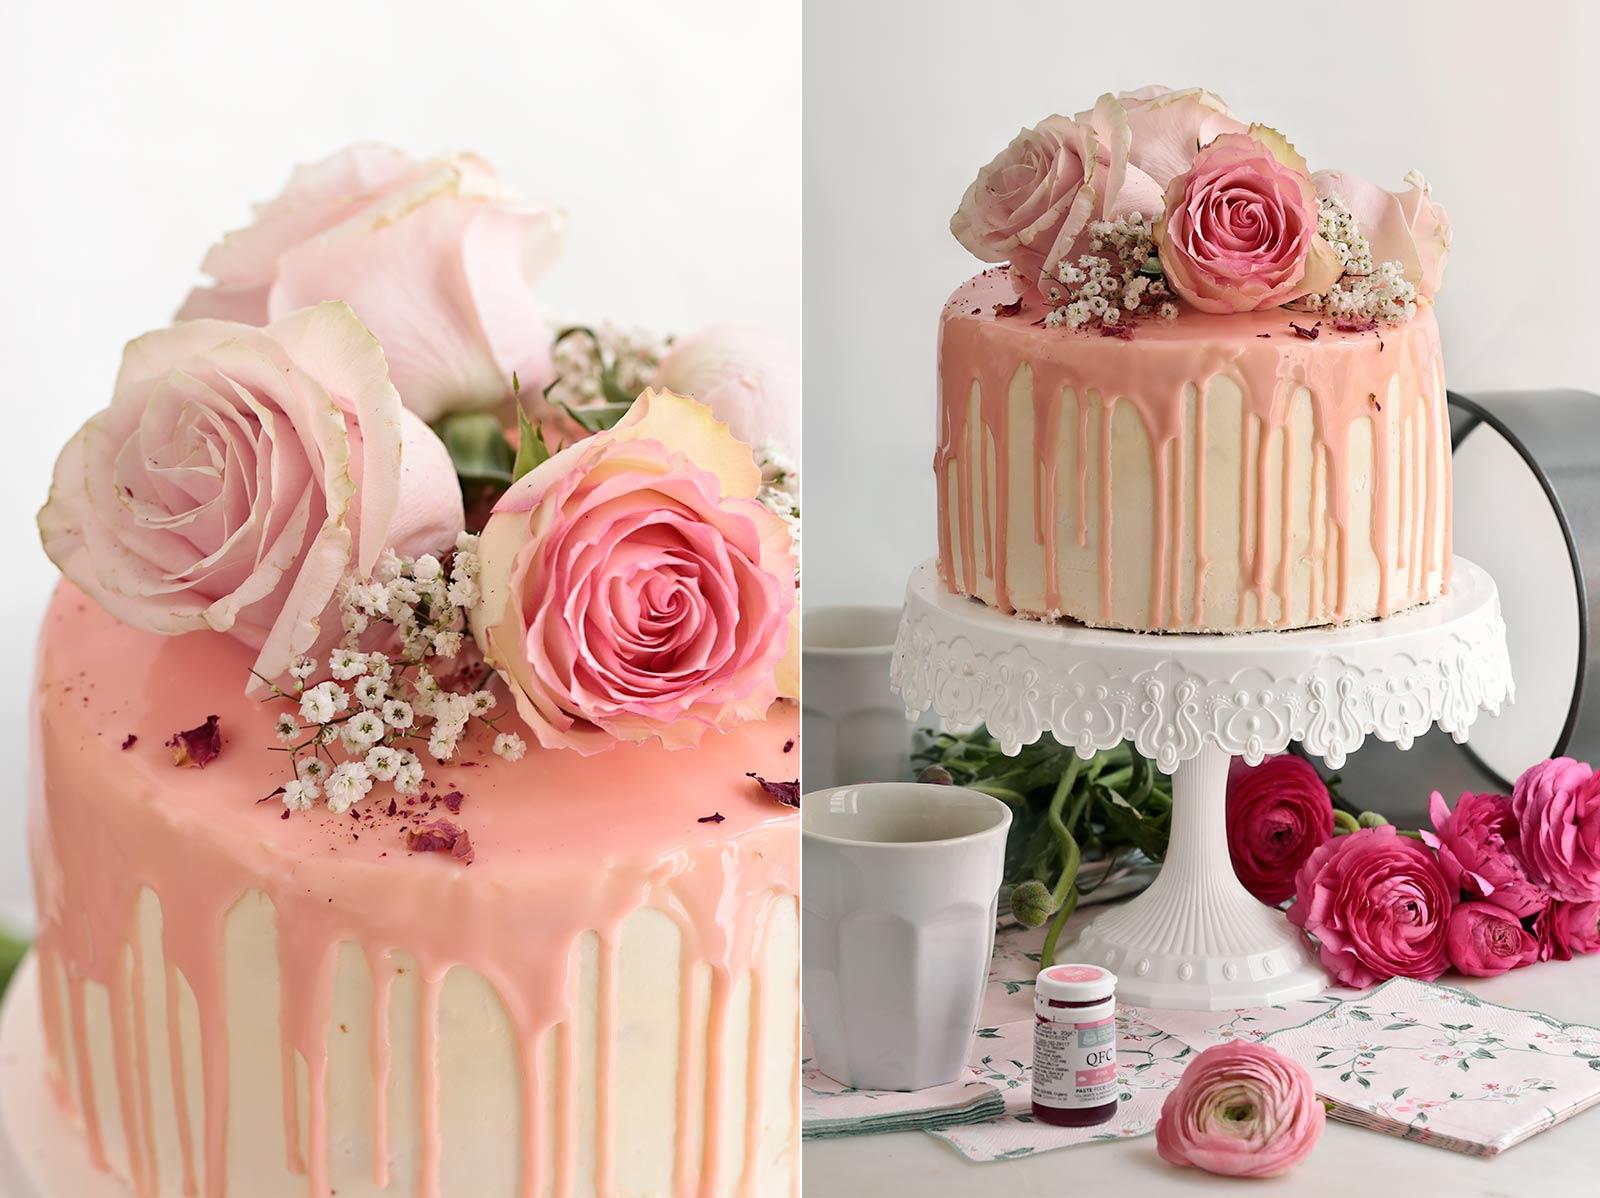 Receta layer cake de frambuesa y limón